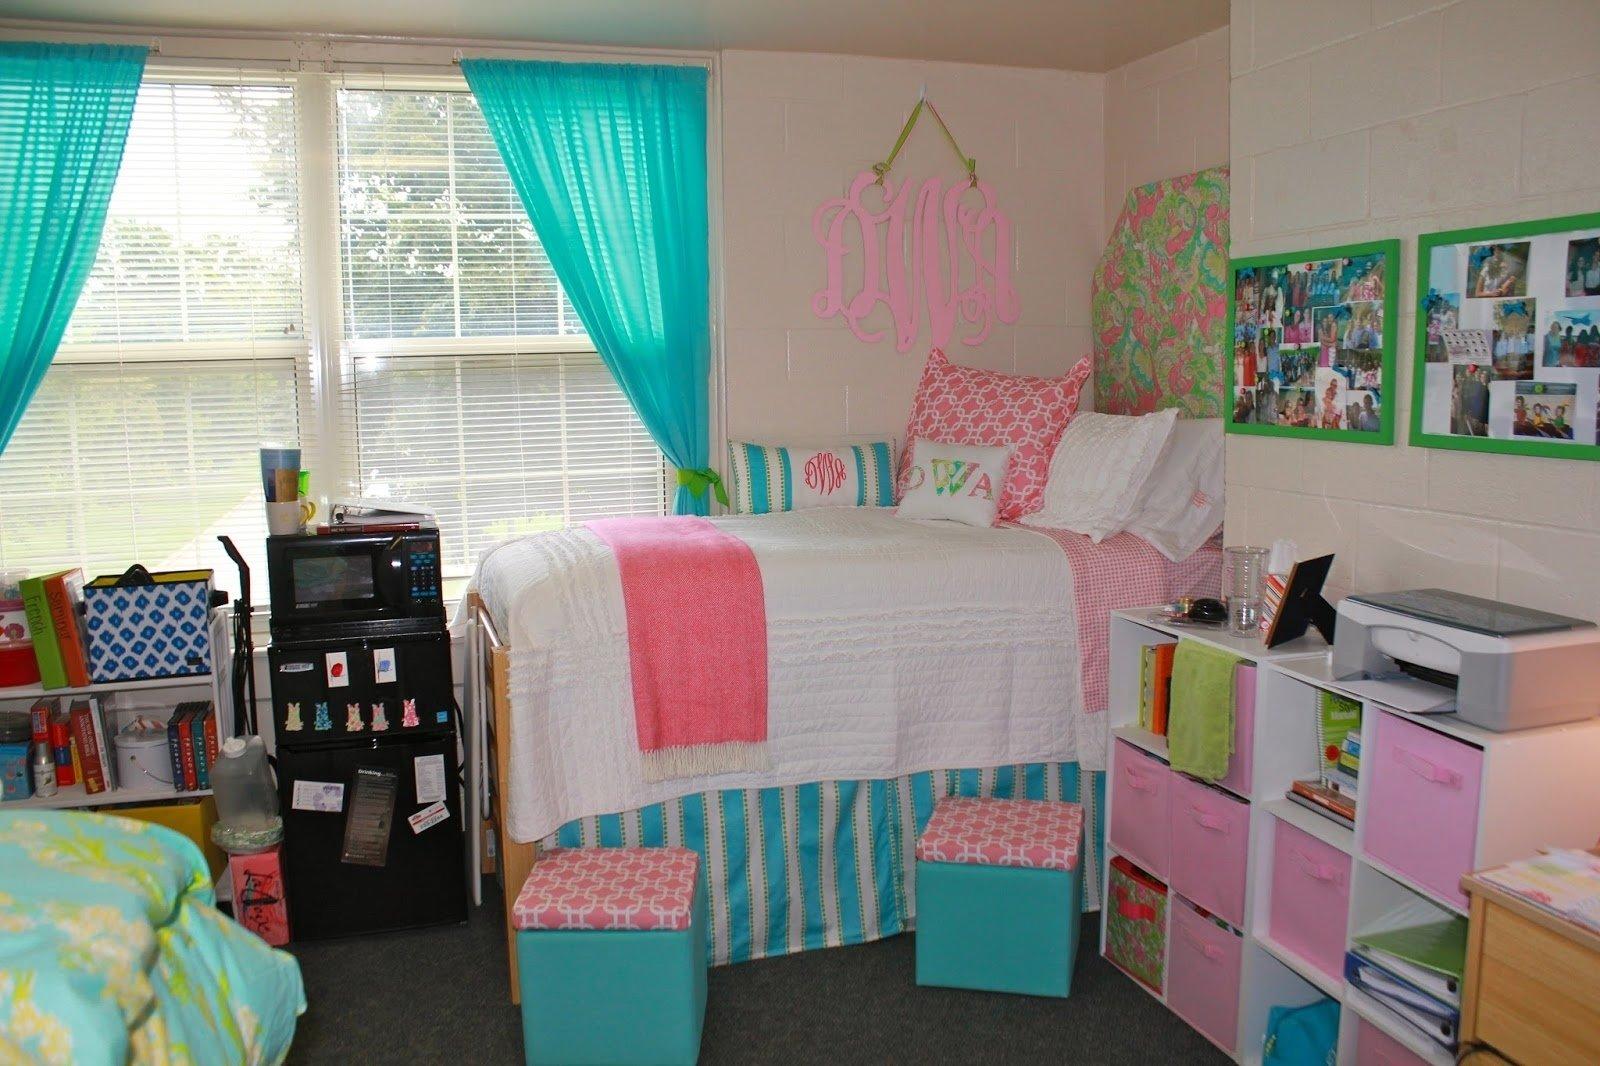 10 Cute Dorm Room Decorating Ideas Diy cute dorm decor diy gpfarmasi 7275df0a02e6